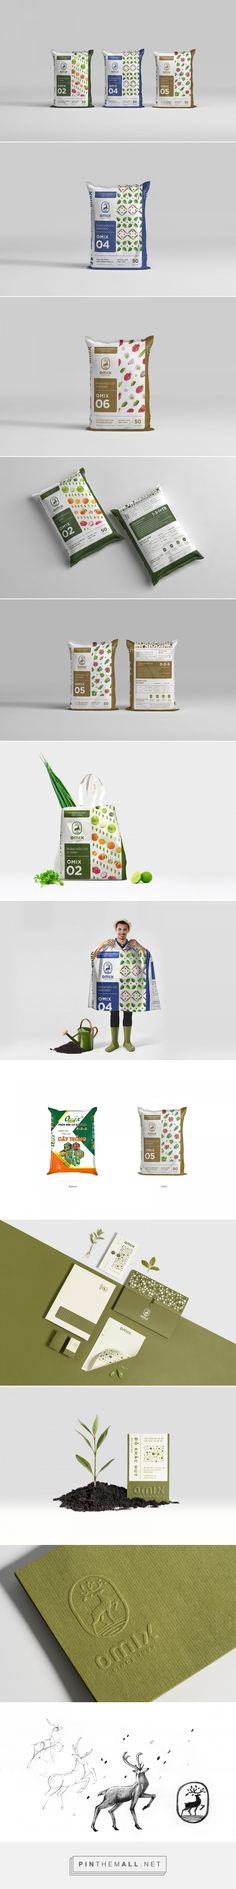 Phan Bon Omix packaging design by Bratus Agency - https://www.packagingoftheworld.com/2018/02/phan-bon-omix.html